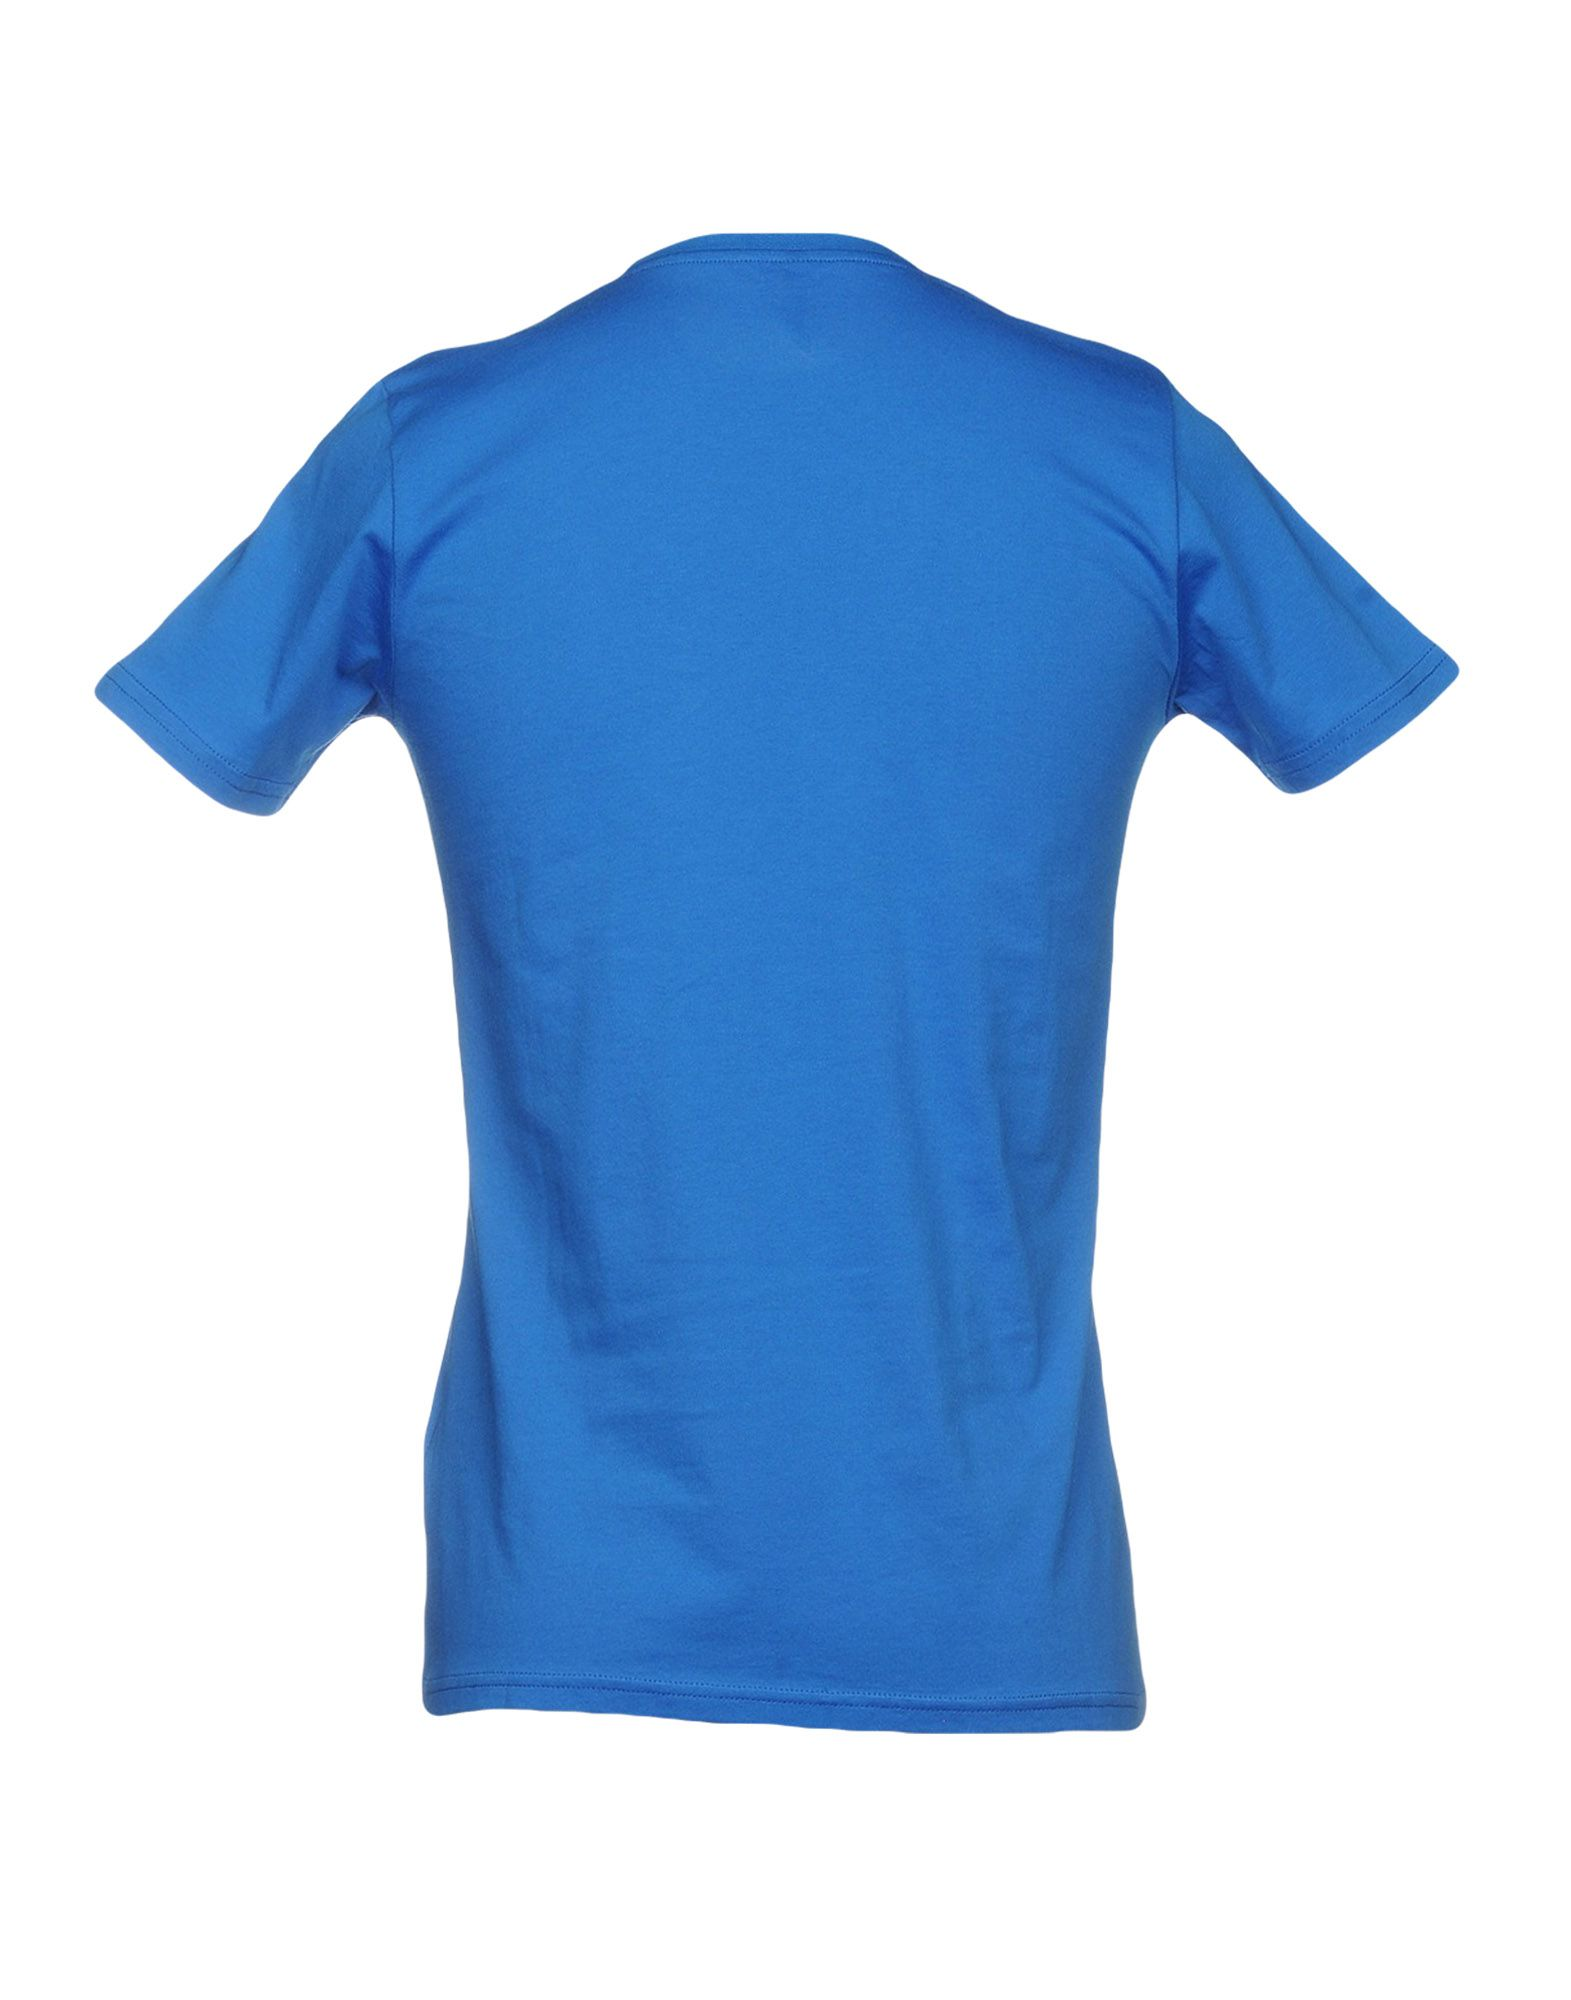 A A buon mercato A A buon mercato T-Shirt Sseinse Uomo - 12128553MH 86d900